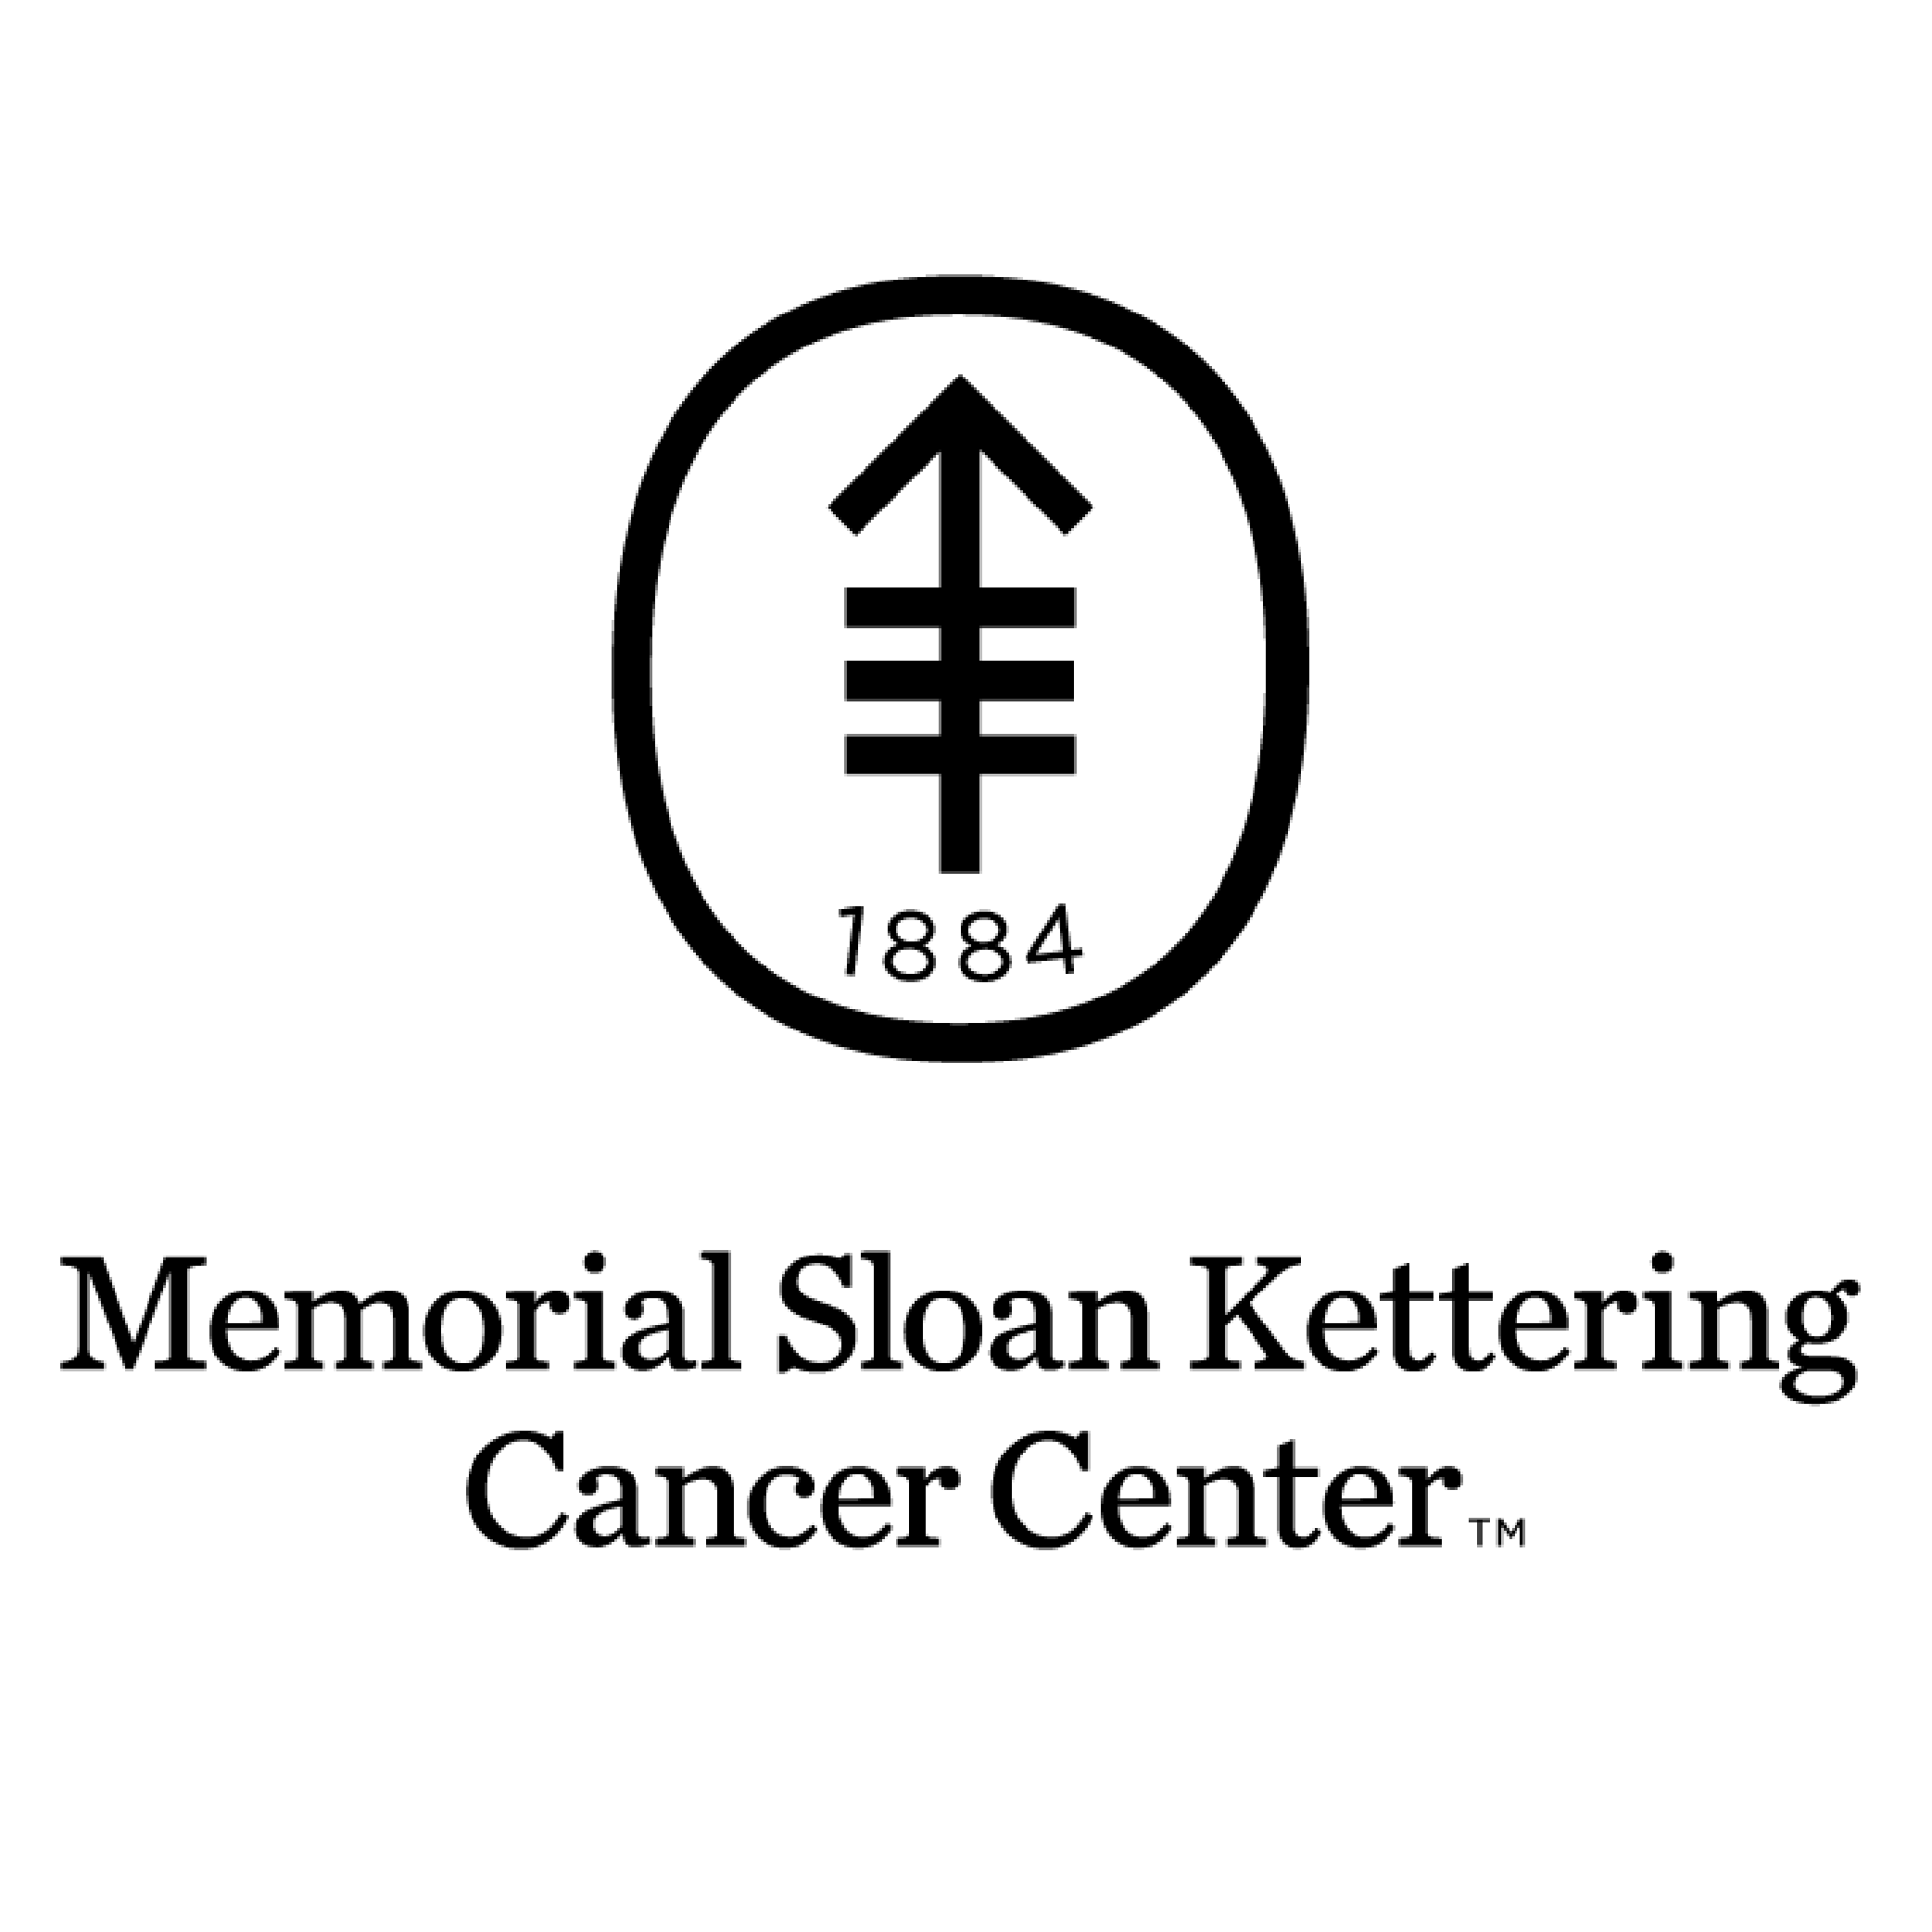 Logos-Formatted-Master-04